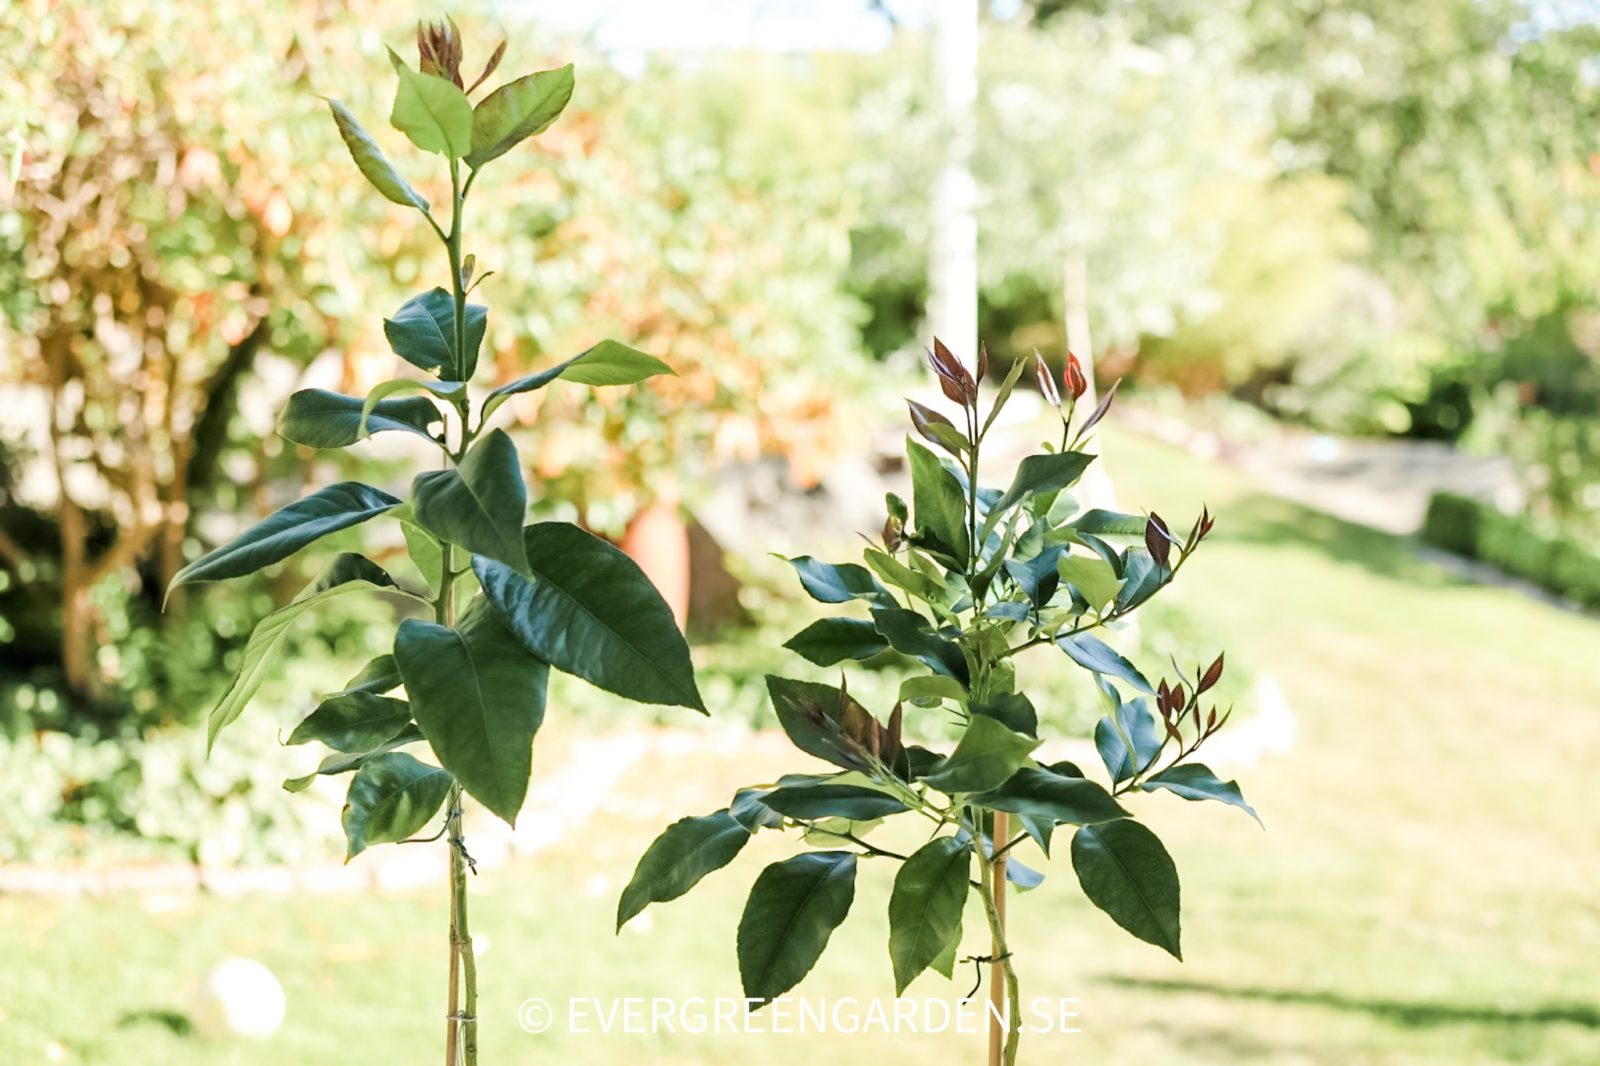 Citrusplantor